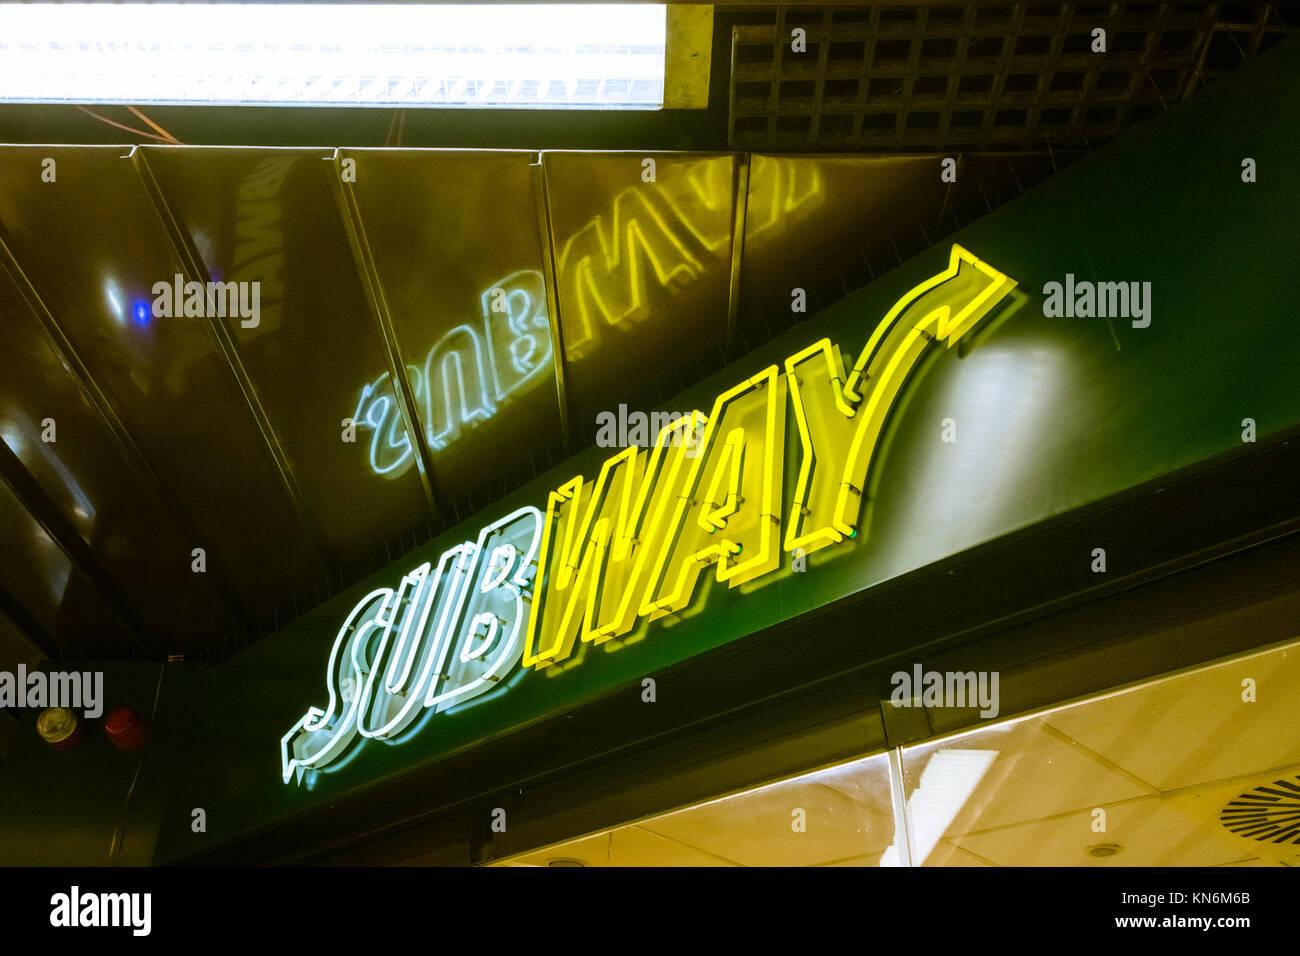 Subyway Restaurant Logo in Stuttgart Stadtmitte Subway Station October 27 2017 - Stock Image